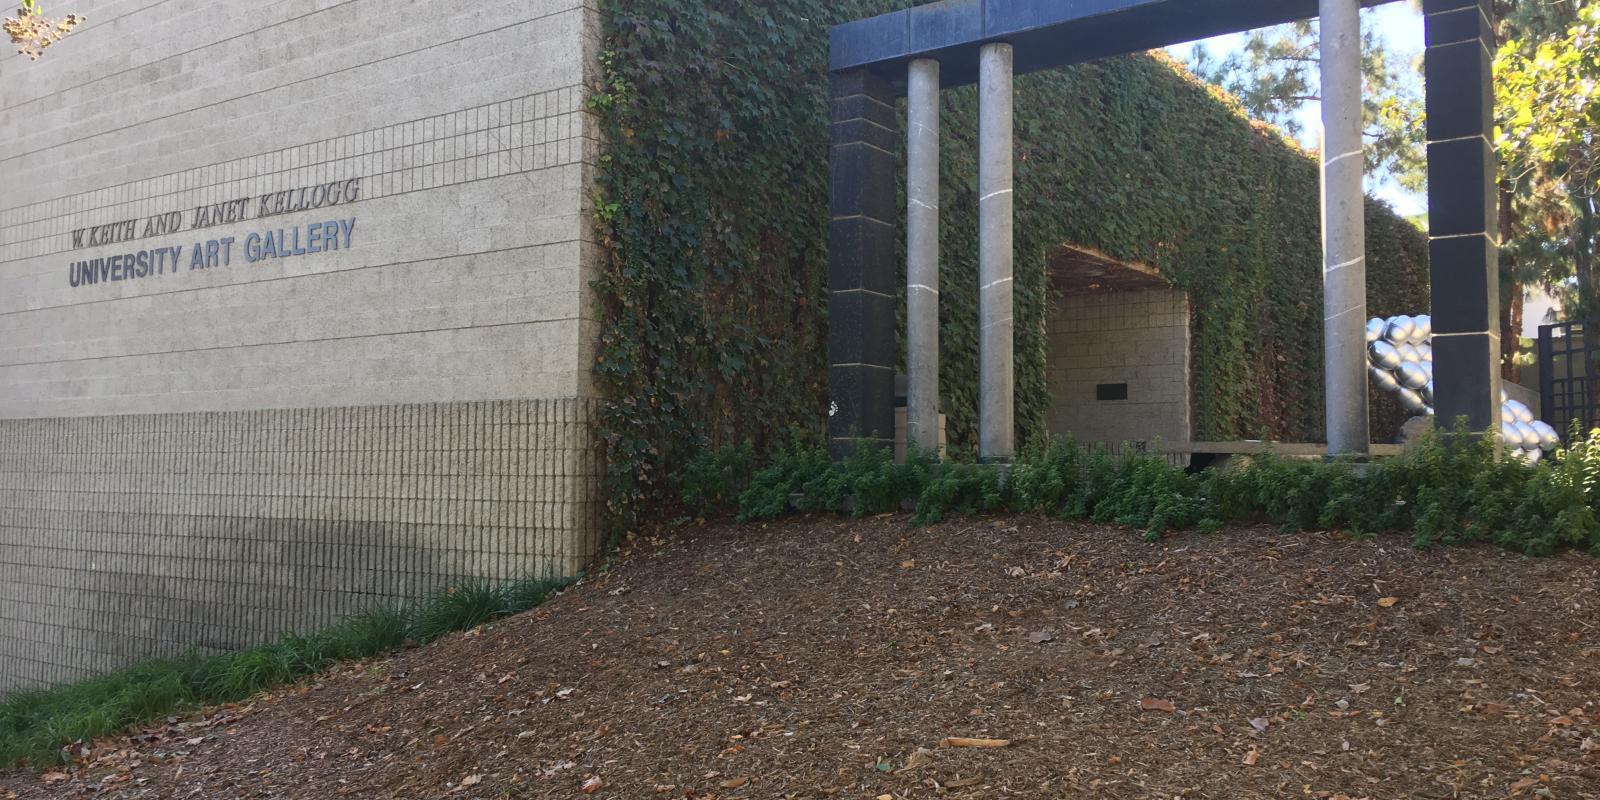 Kellogg University Art Gallery